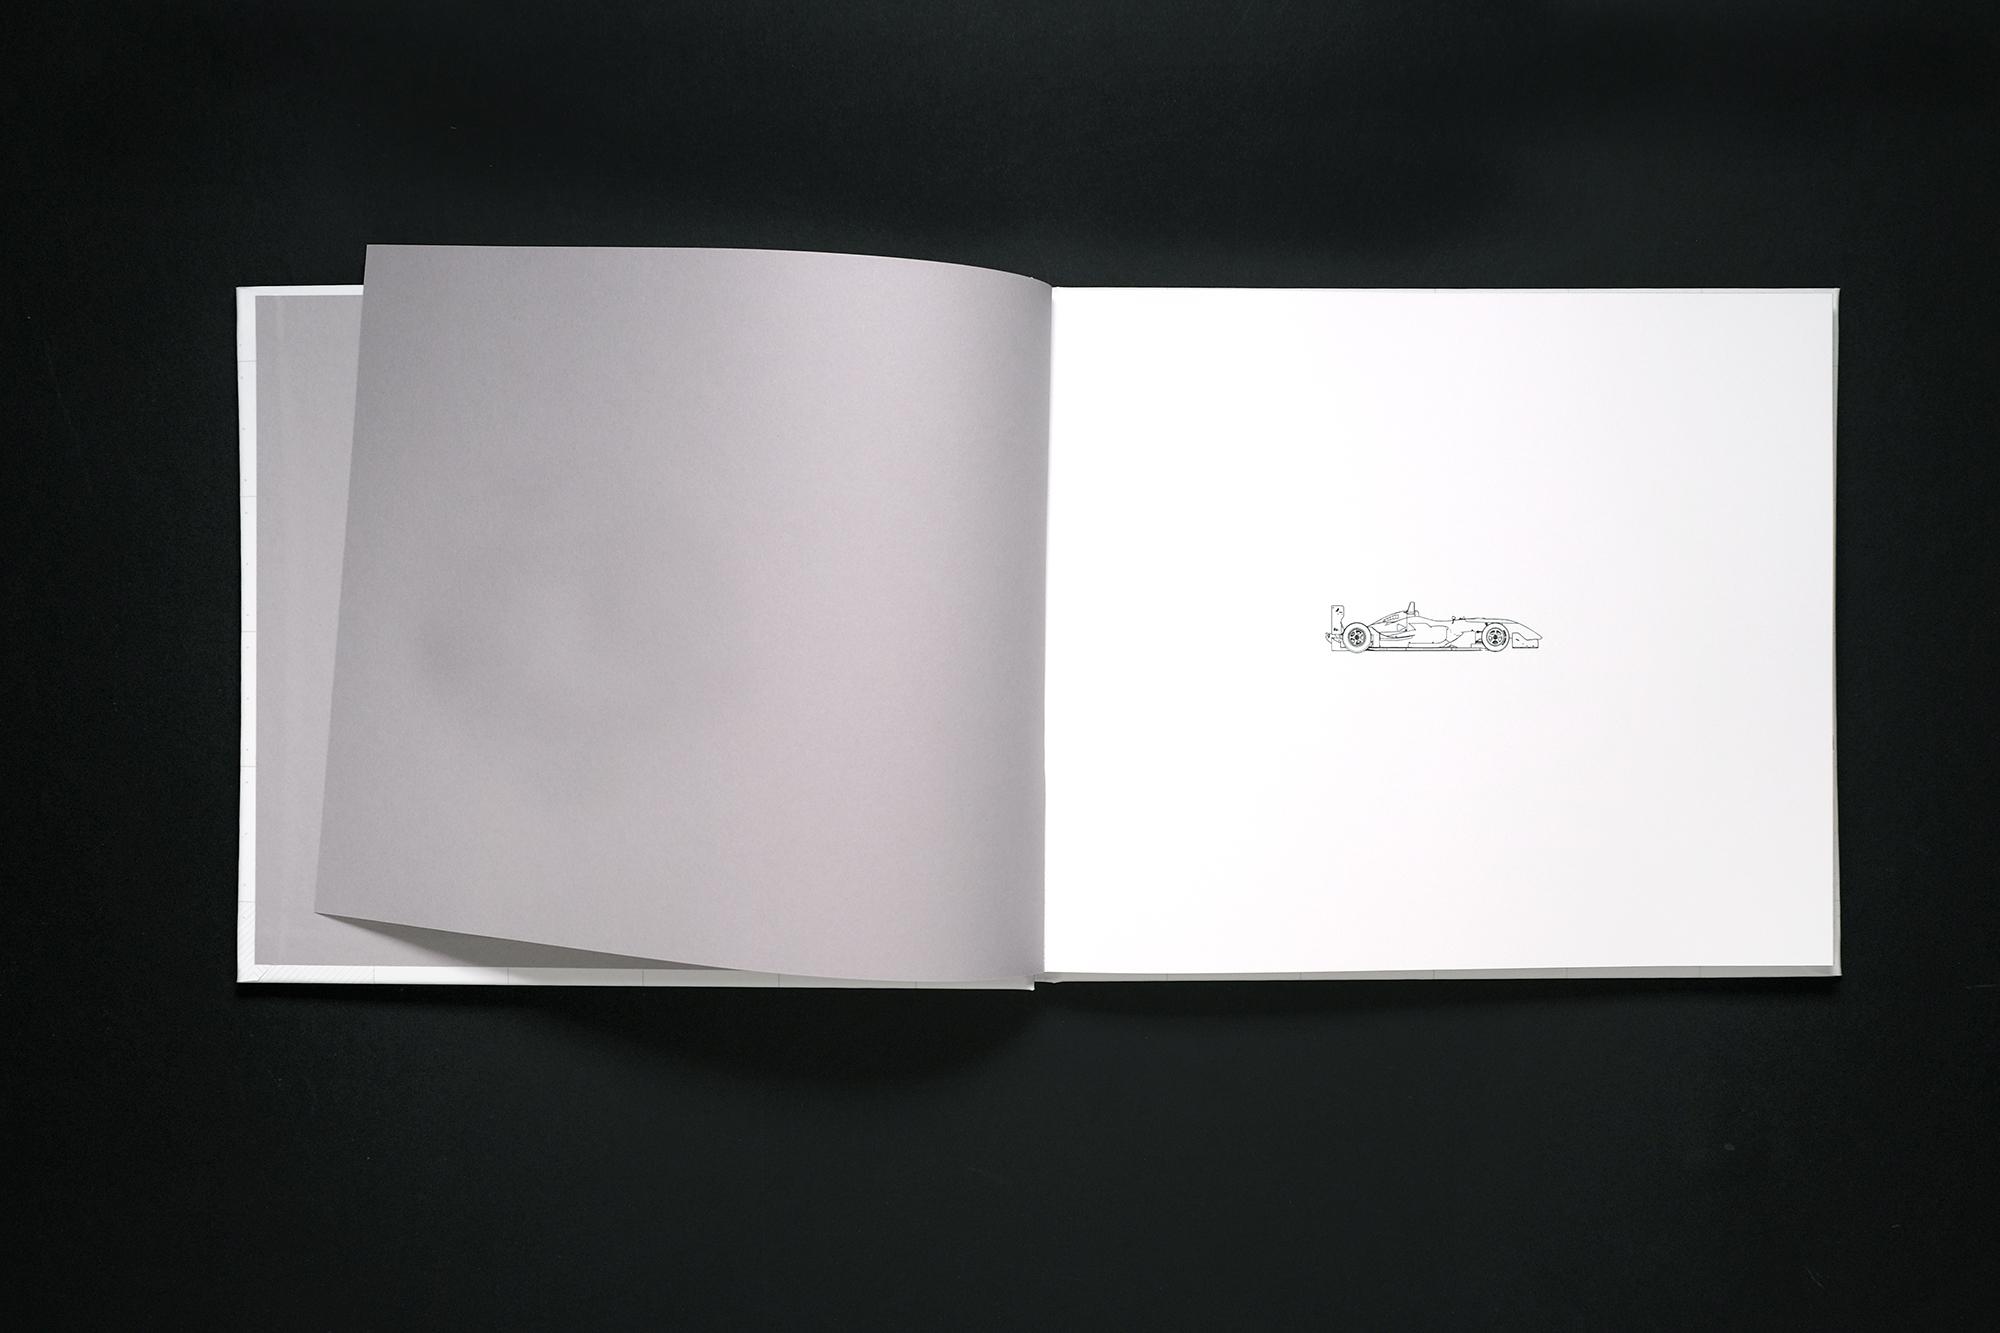 http://rusyndesign.co.uk/wp-content/uploads/2020/04/UWR-19-book-shots-02.jpg